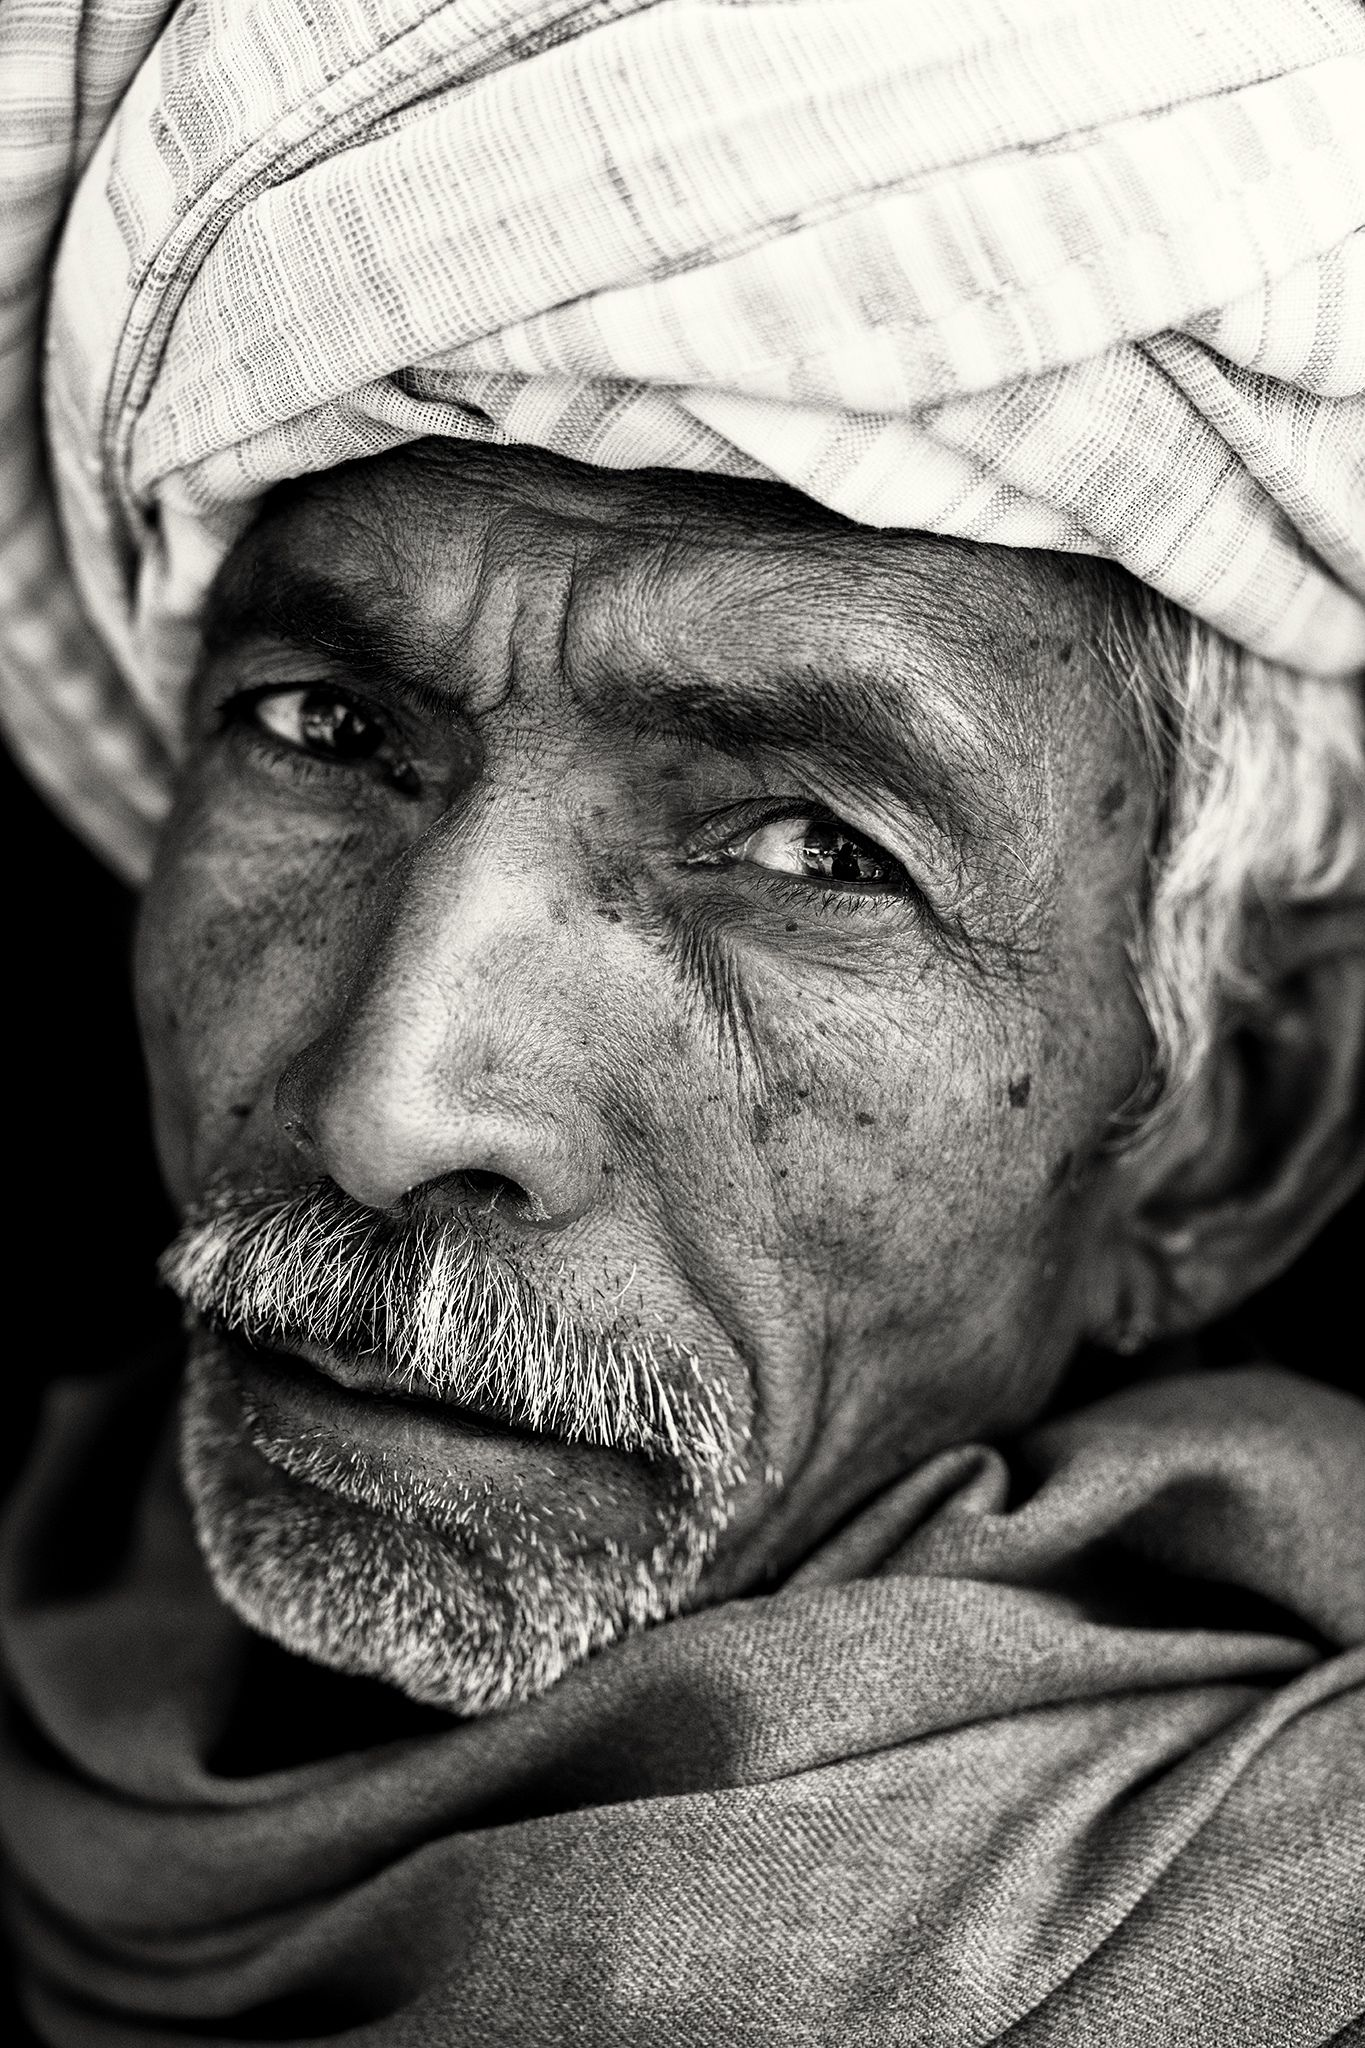 Old rajasthani man india مشاهد من الهند black white portraits